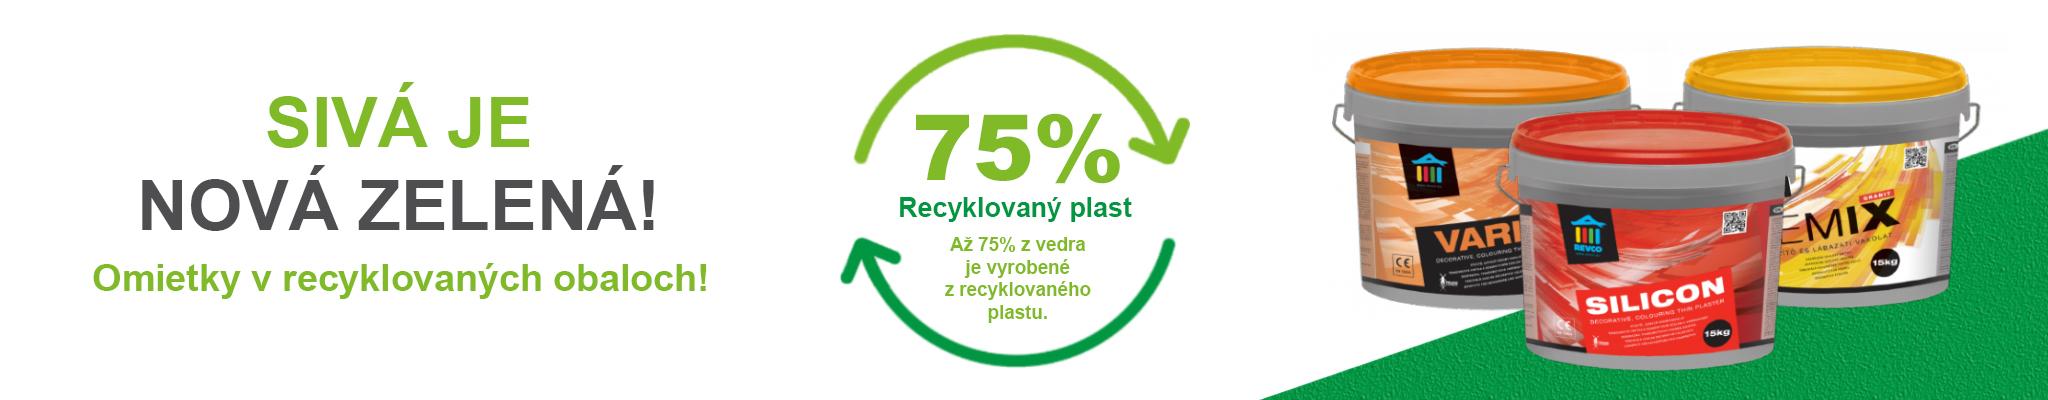 EKO - recyklované obaly